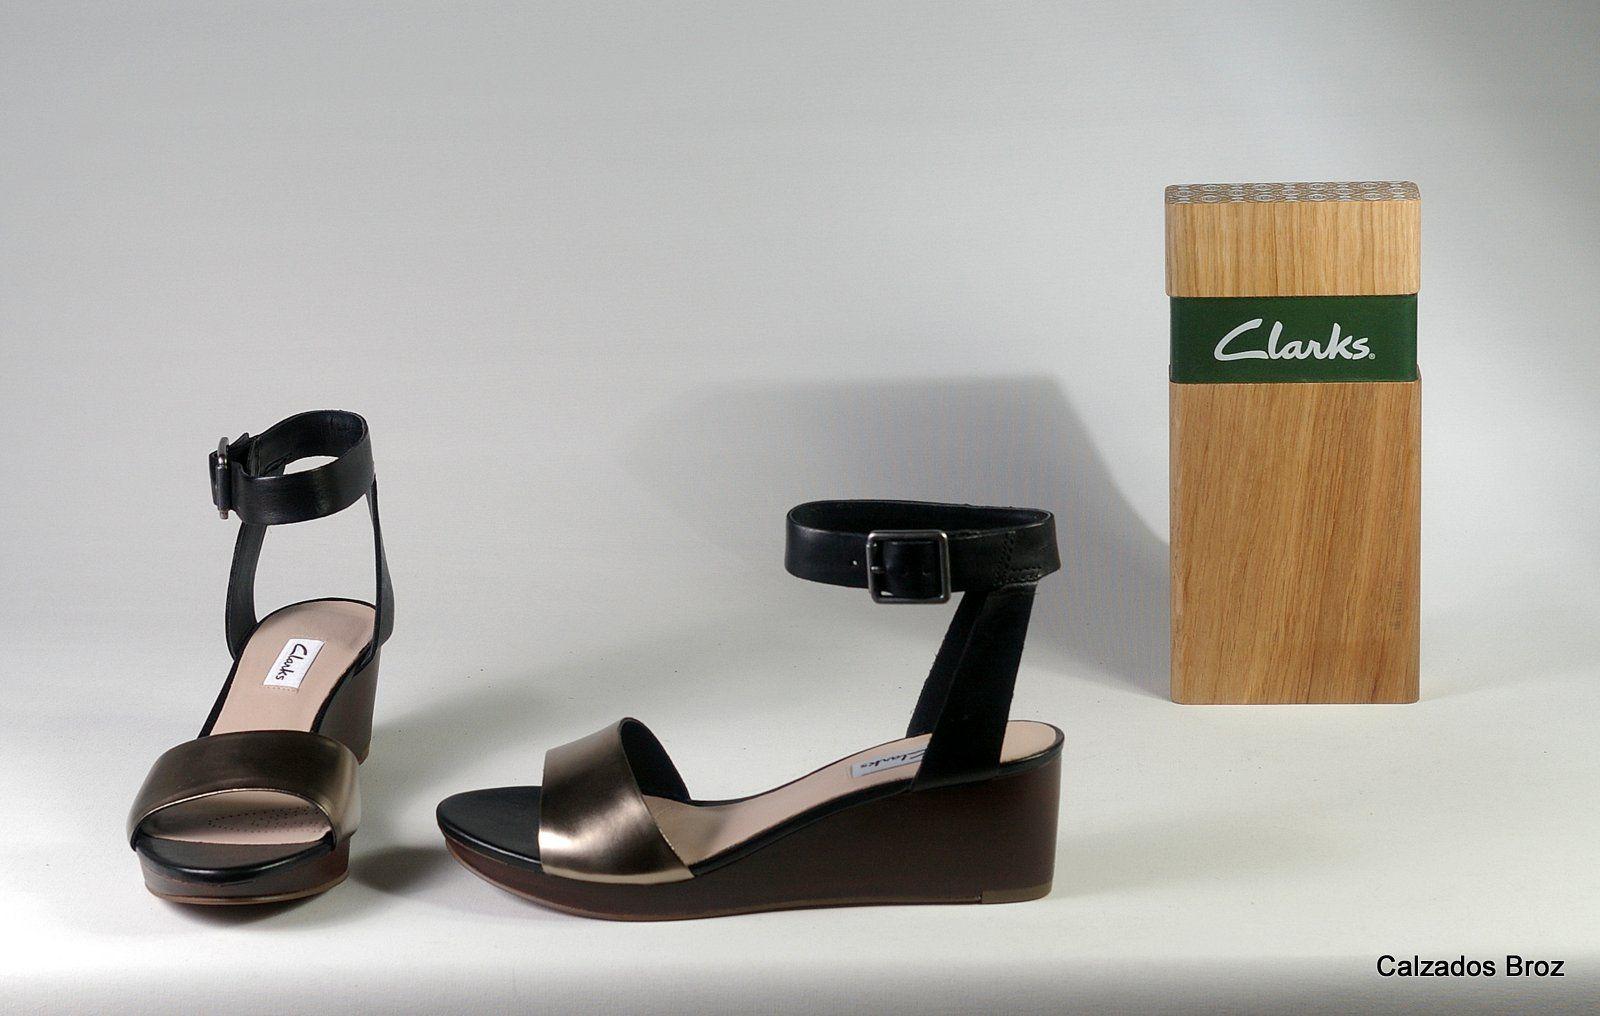 Colección Clarks. Sandalia de piel tobillera e con cuña - Negro. (muller).